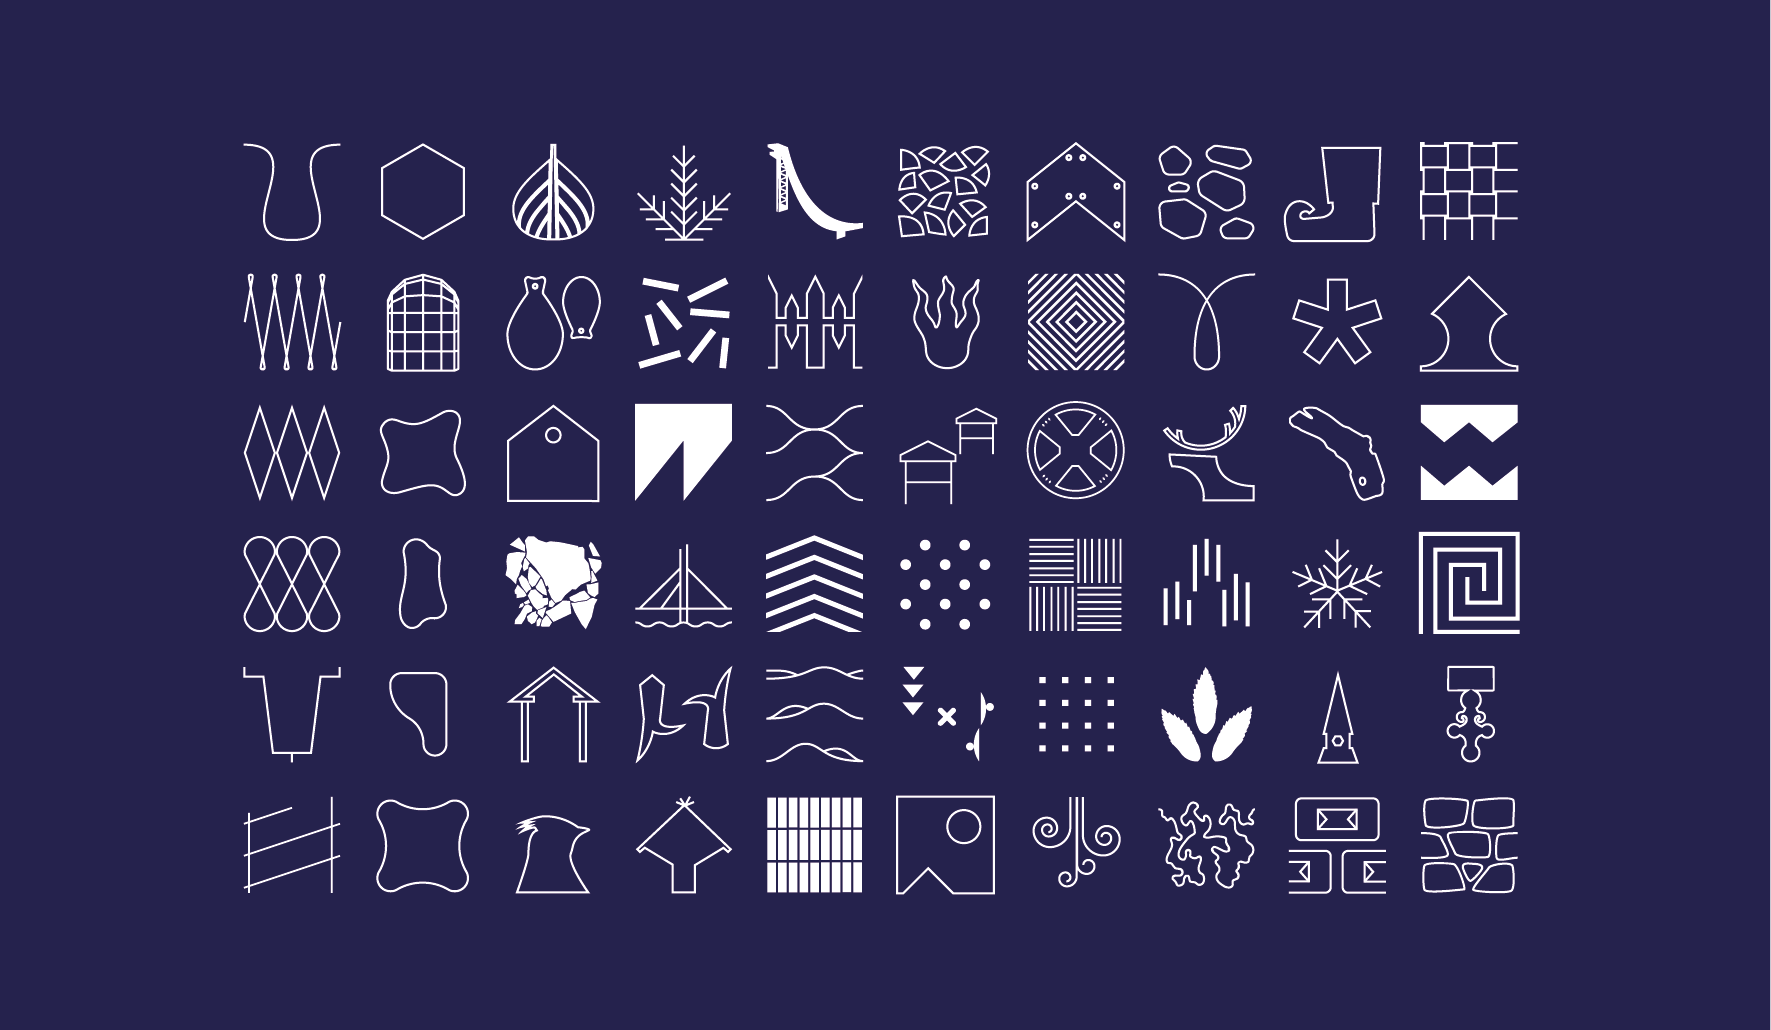 Rovaniemi-symbolit